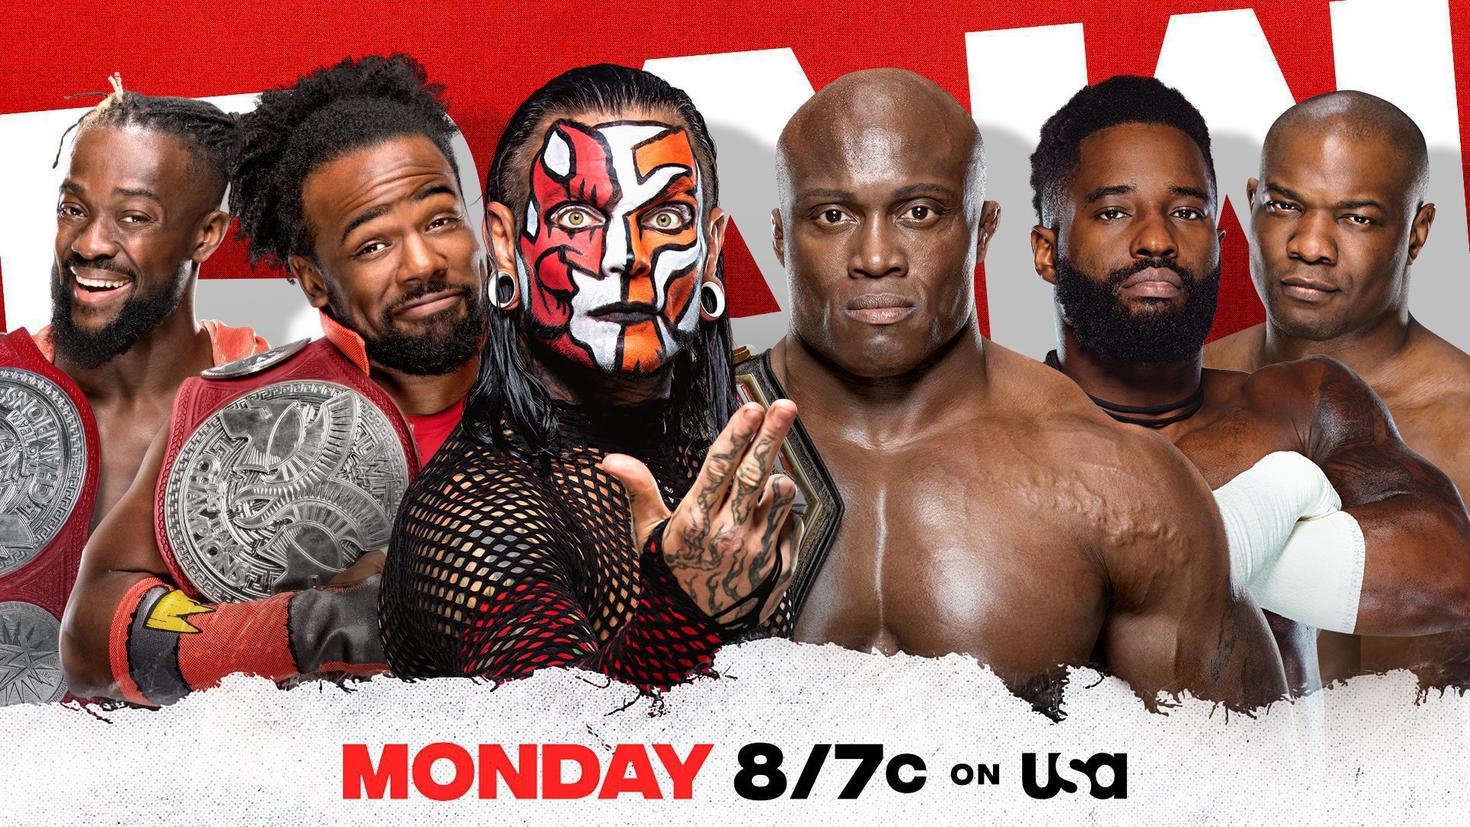 WWE Raw Preview (14/12/20): AJ Styles-Sheamus; Lana-Nia Jax, TLC Go-Home Episode 109